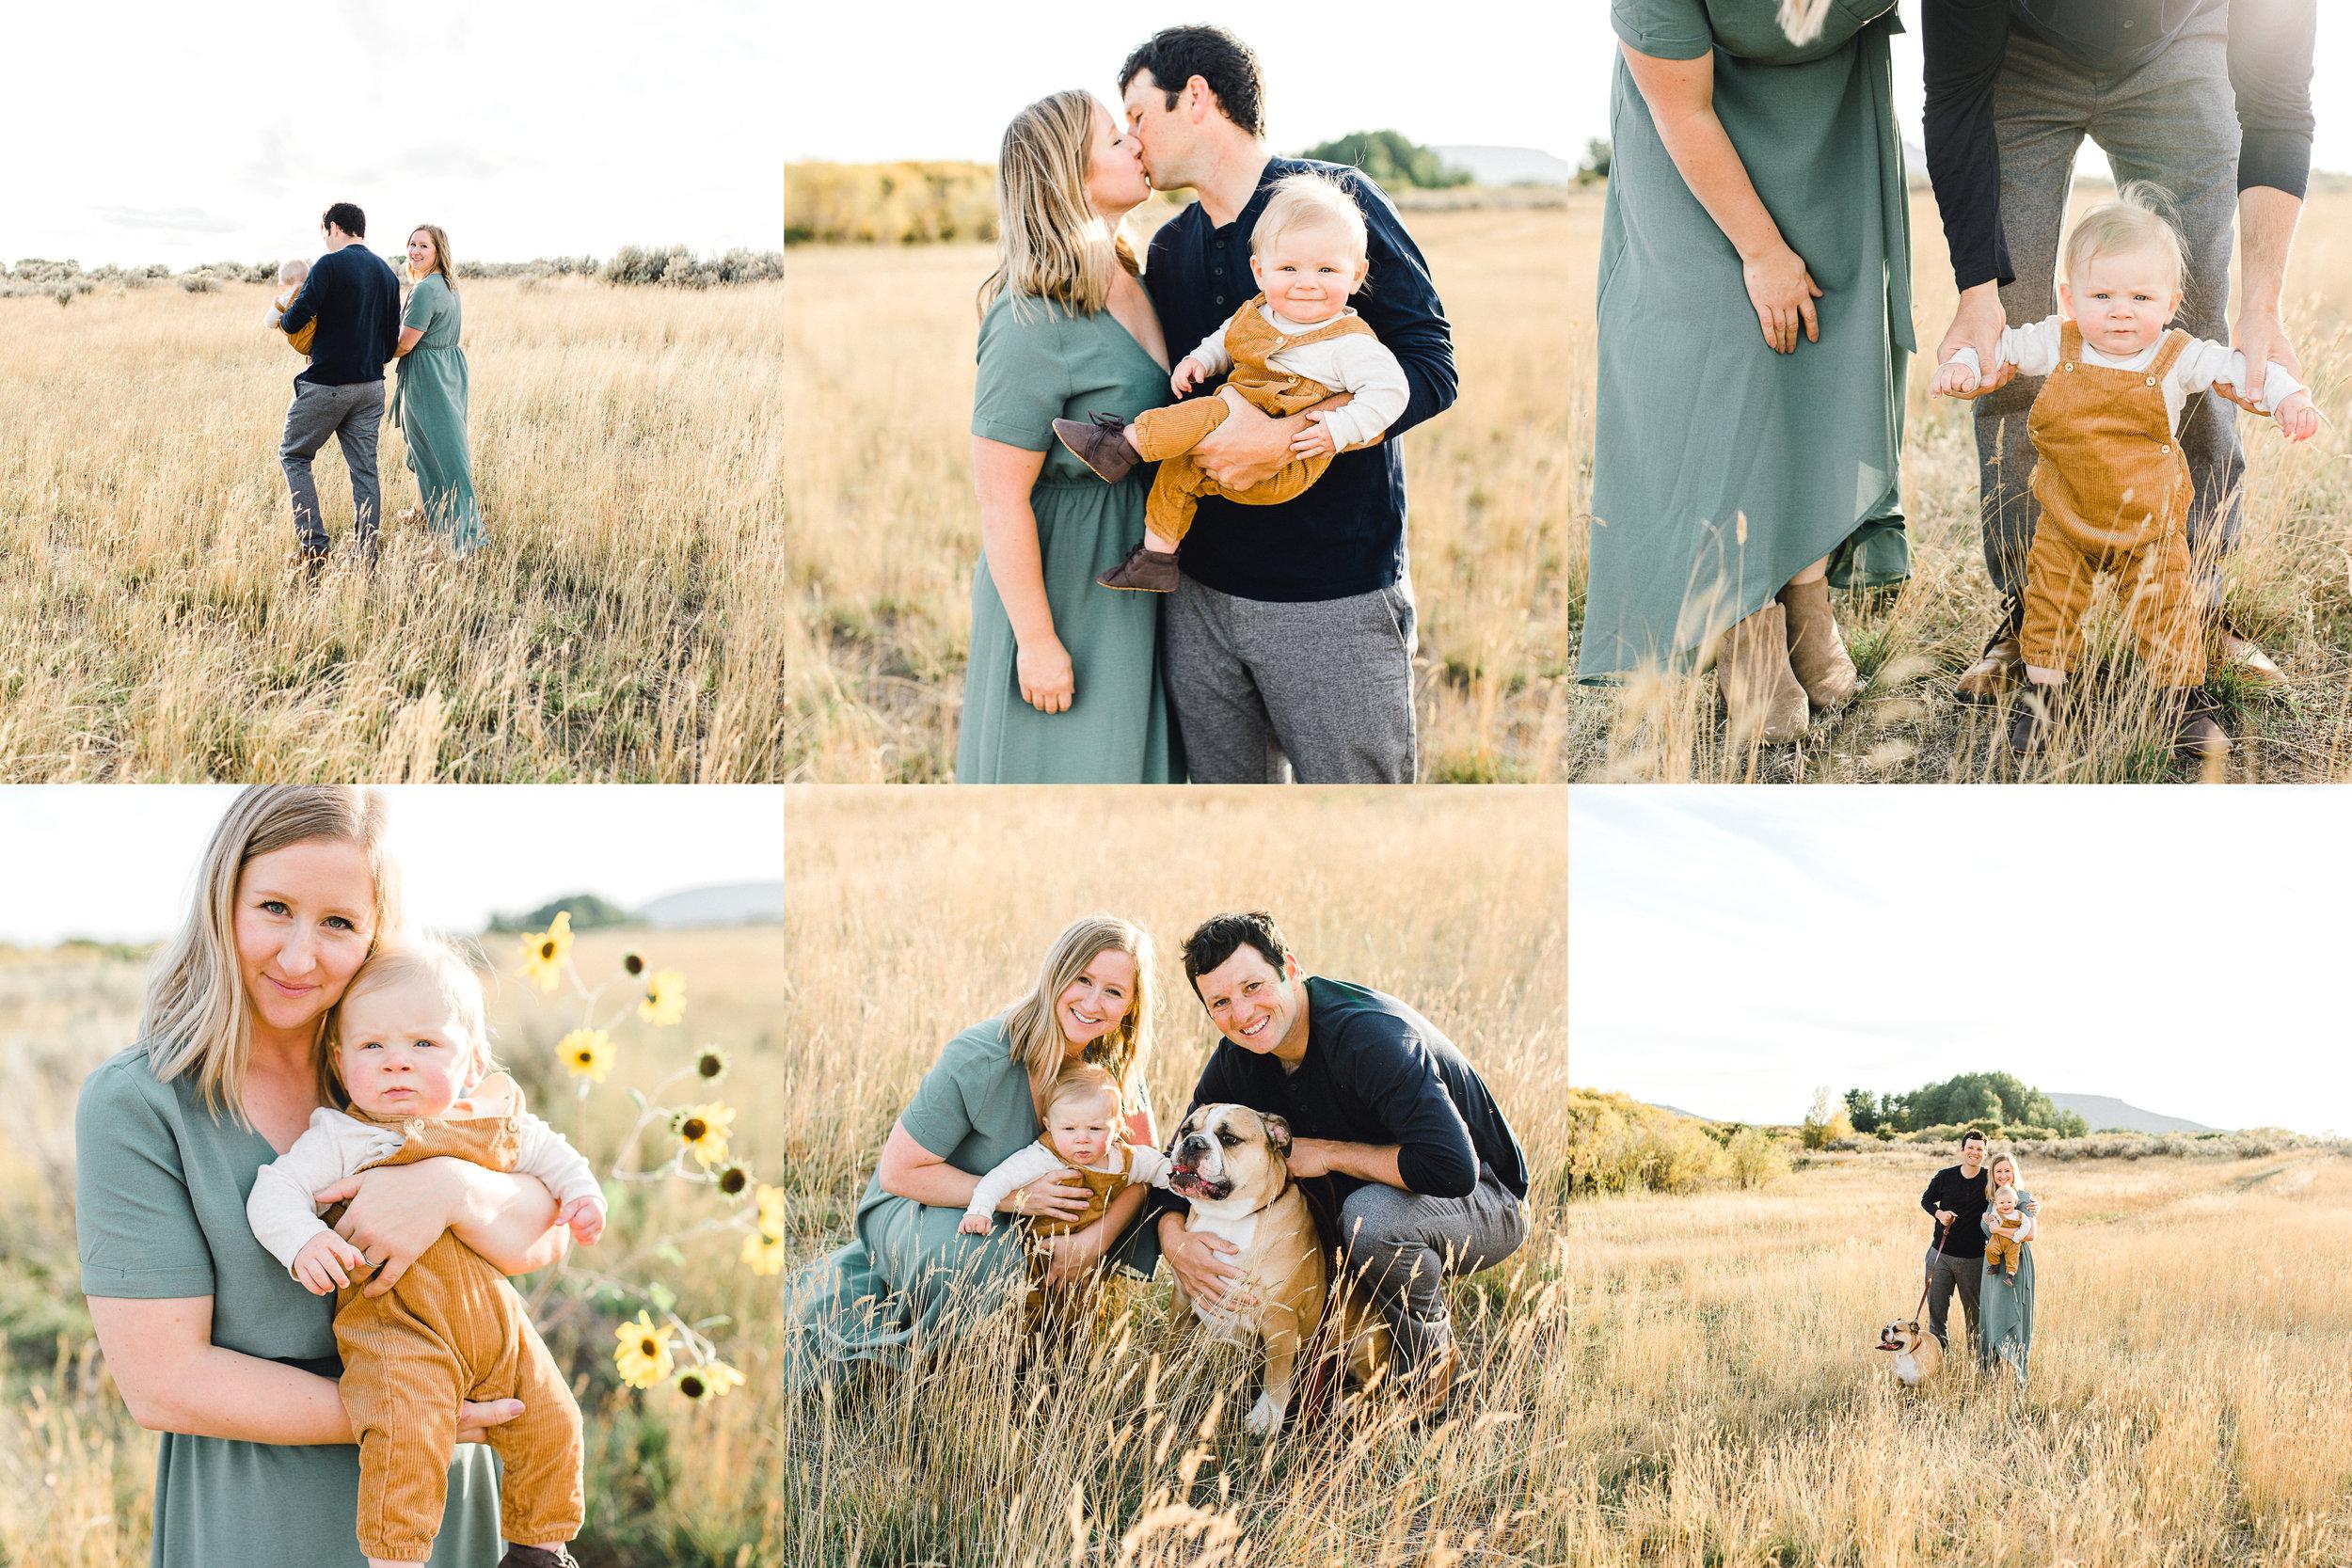 rexburg-idaho-family-photographer-anna-christine-photography-thebestphotographer9.jpg